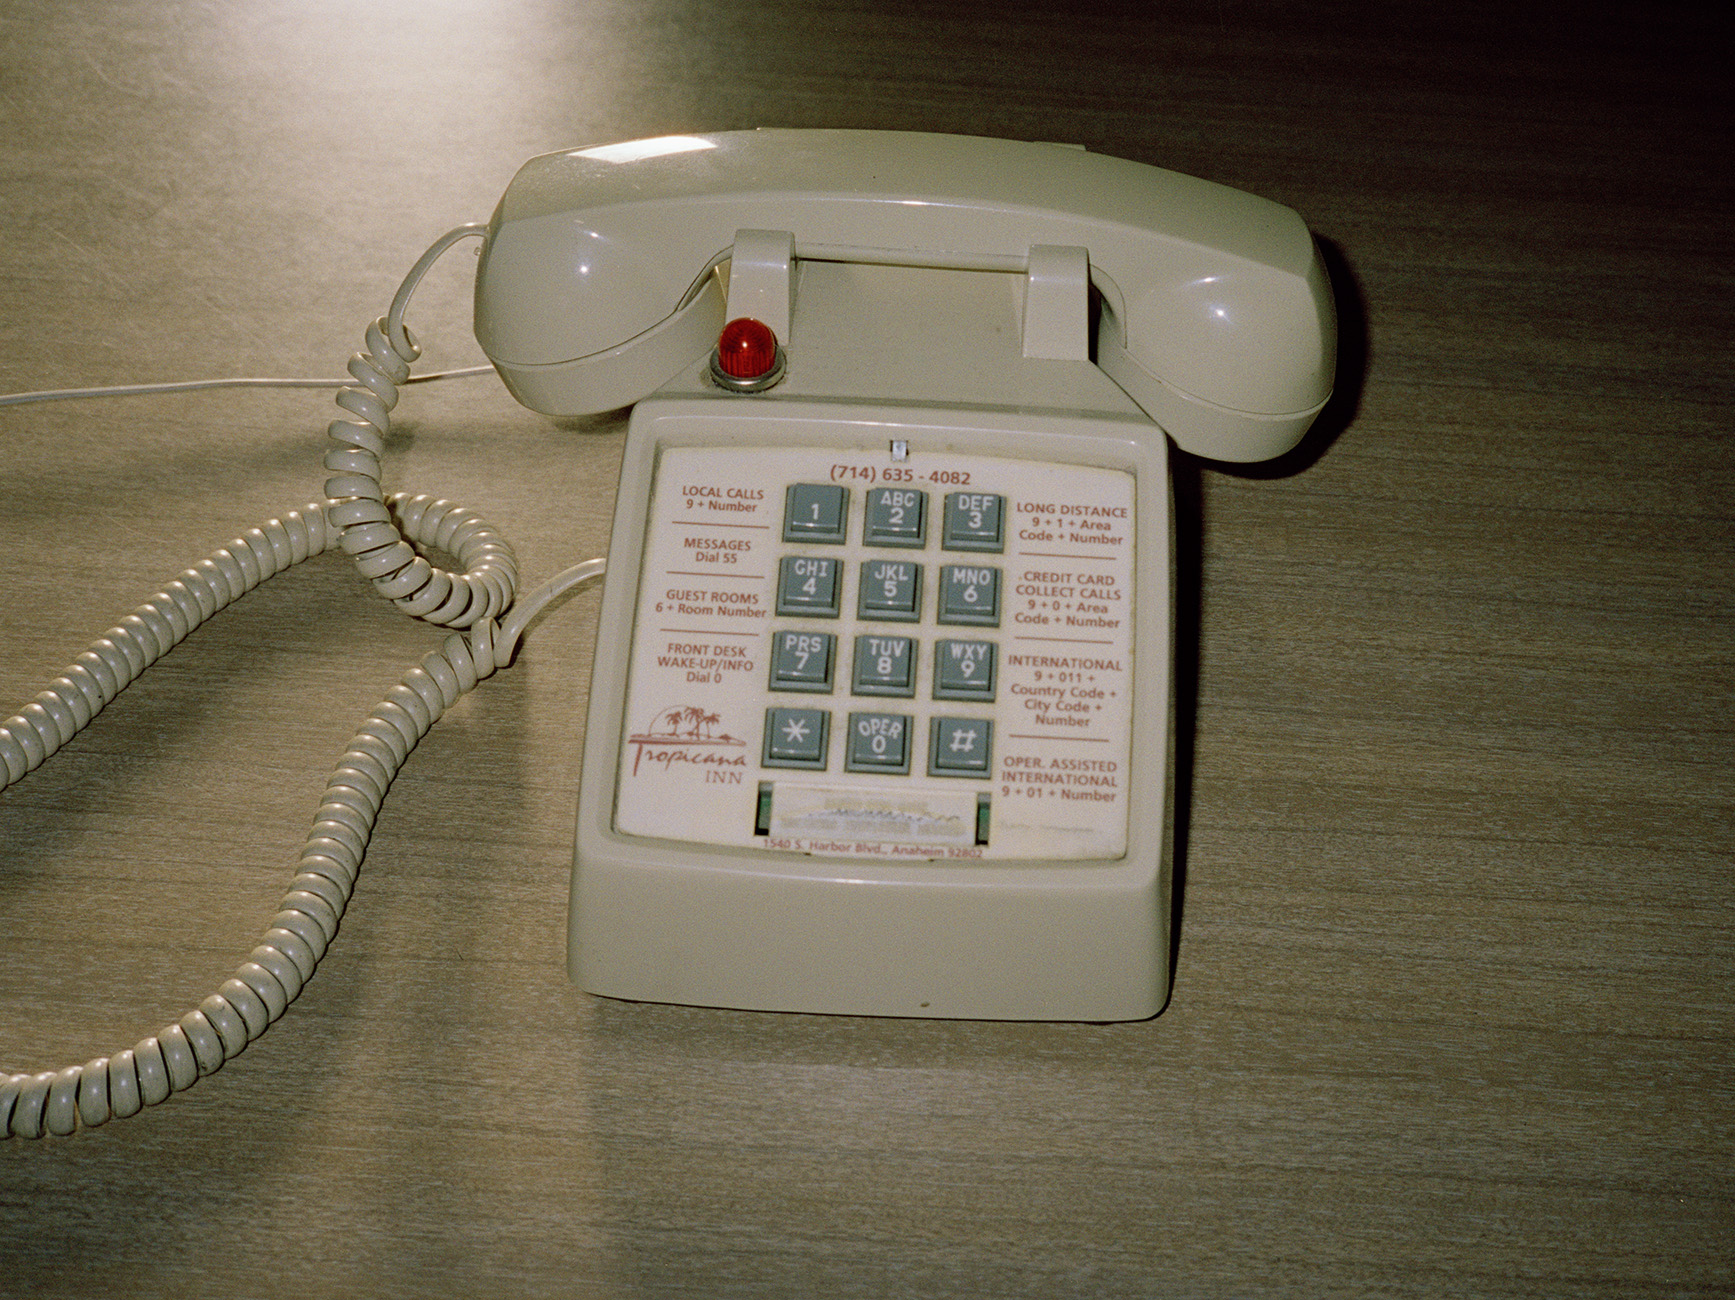 telefon pacific sands copy.jpg